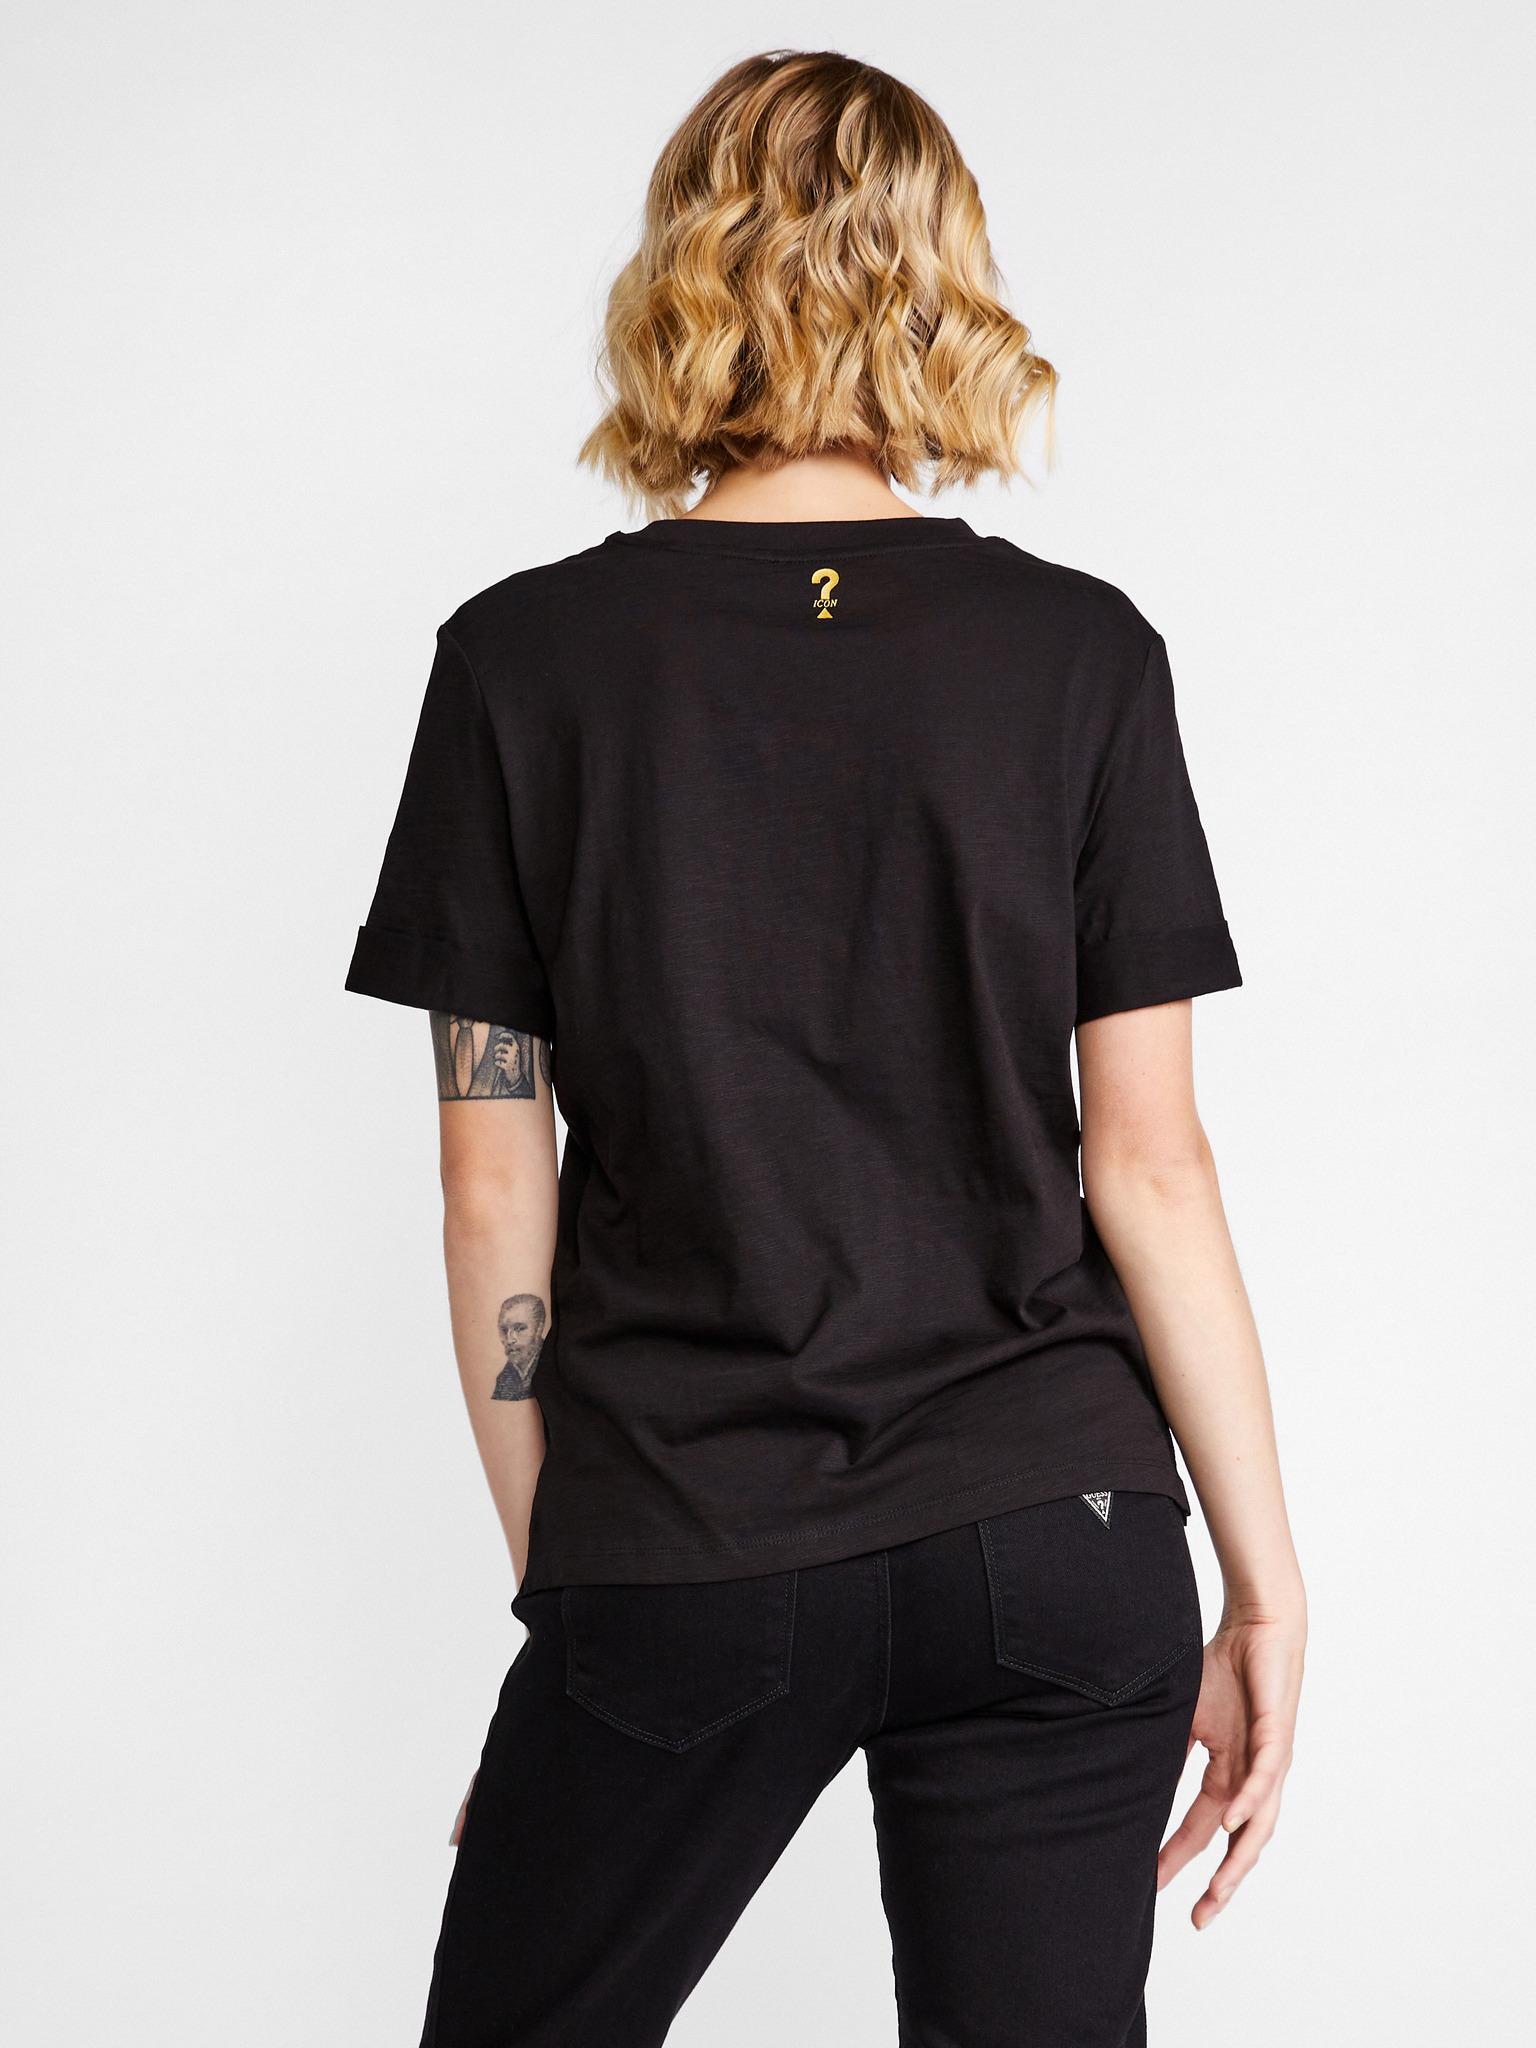 Guess Koszulka damska czarny Triko